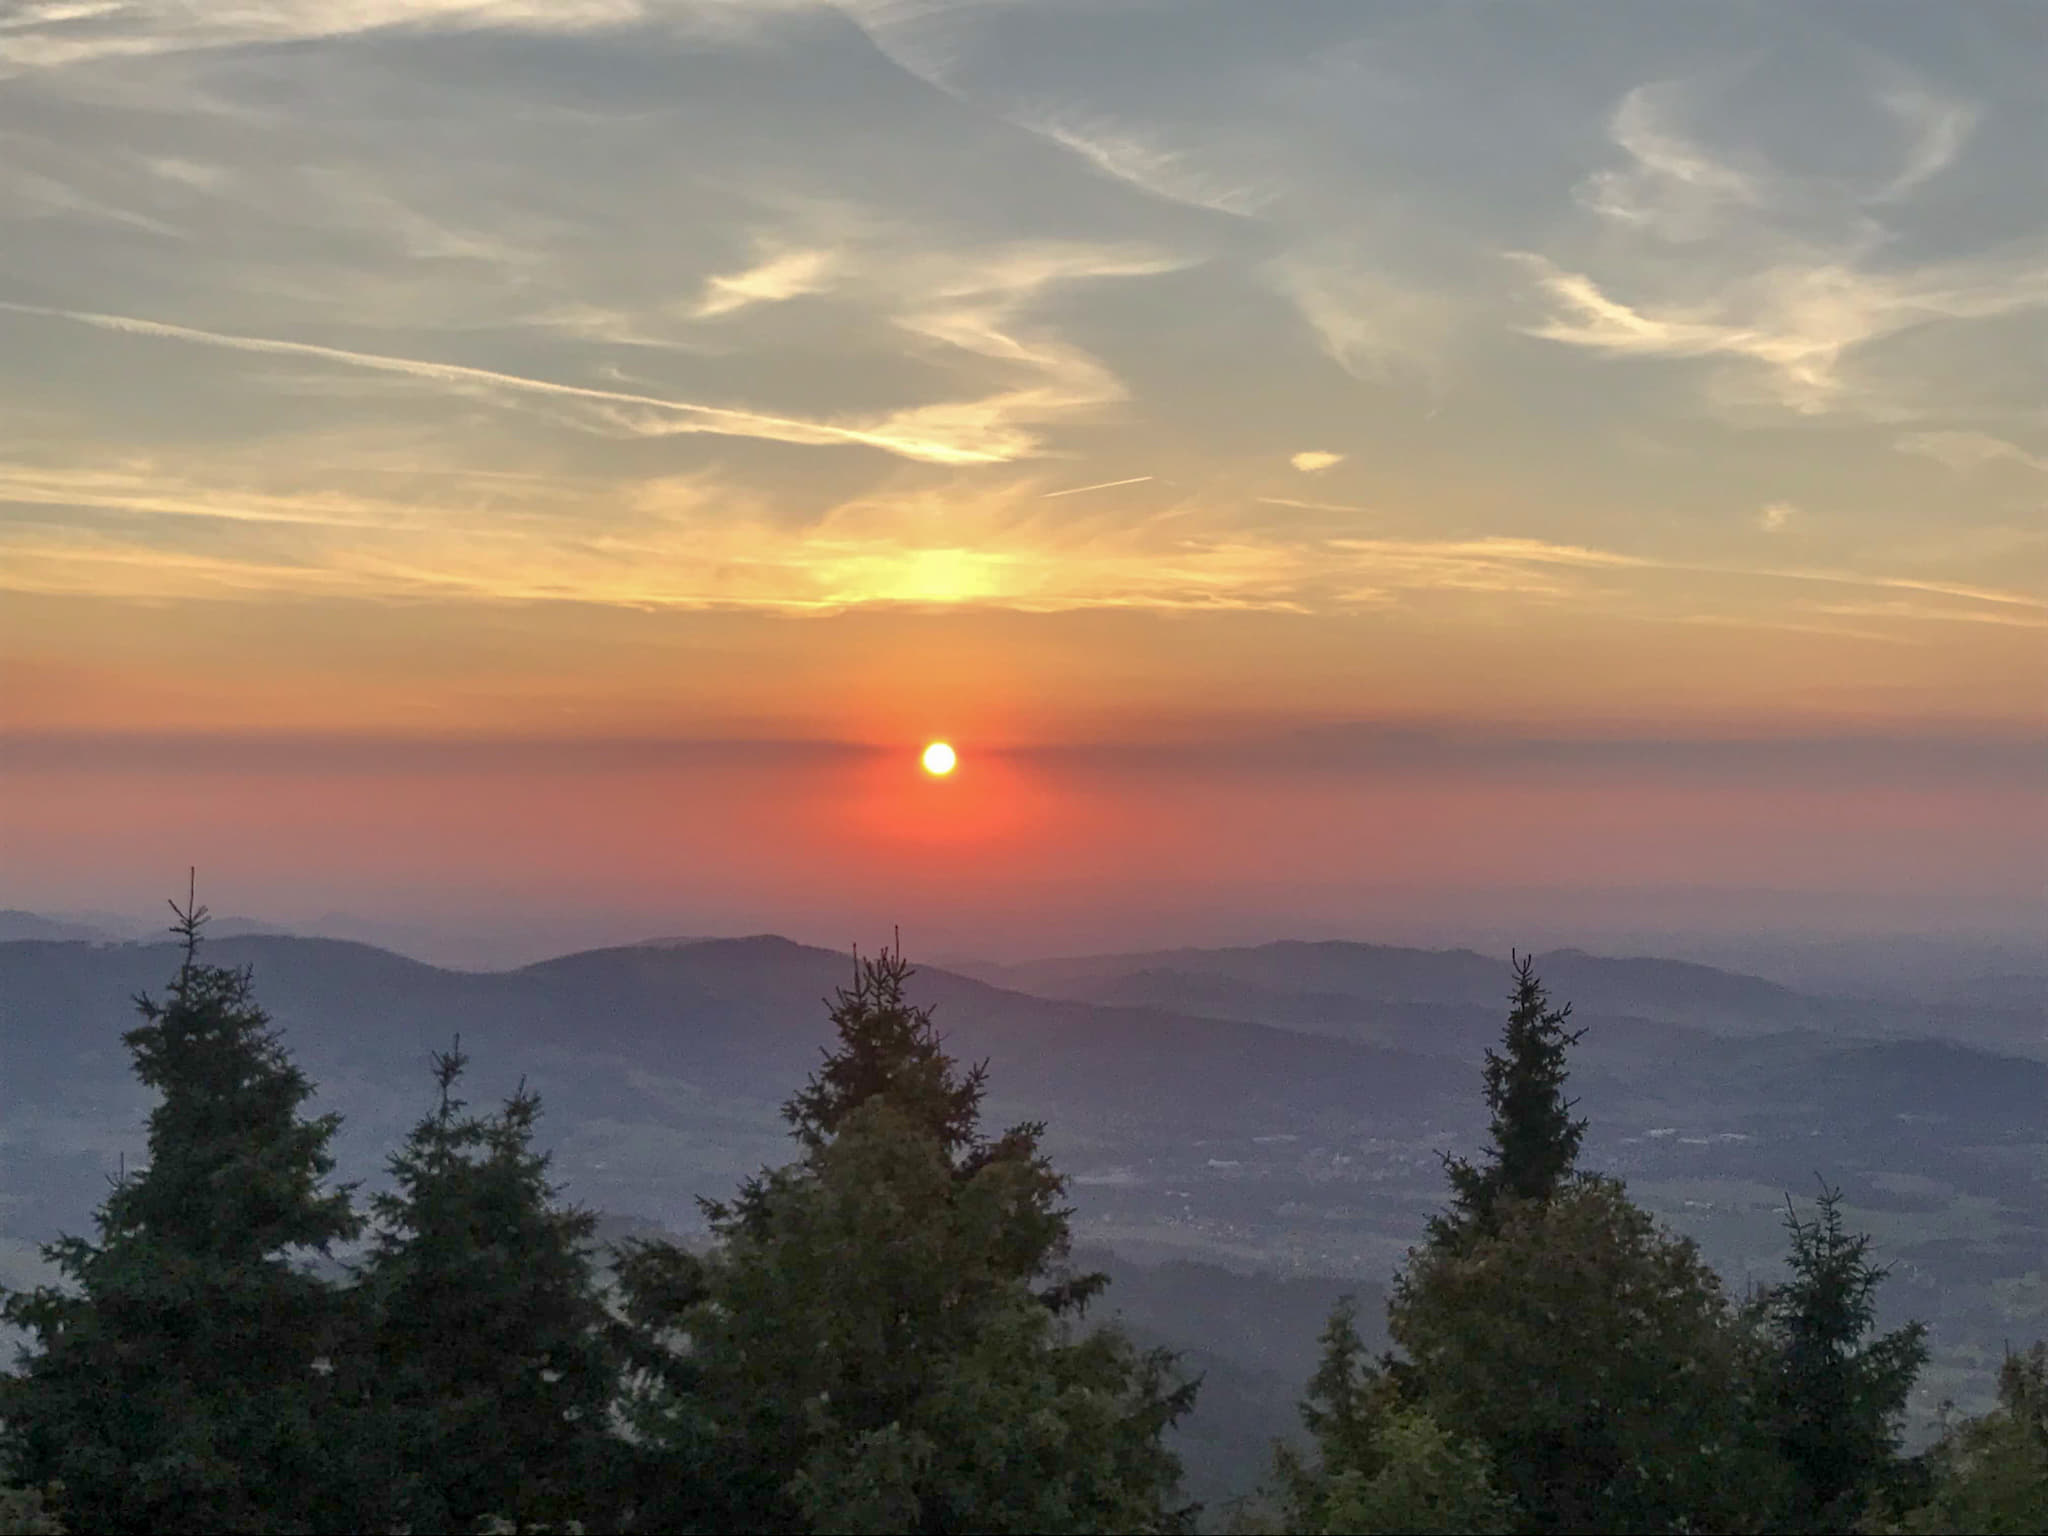 Amazing sunset at Lysa Hora